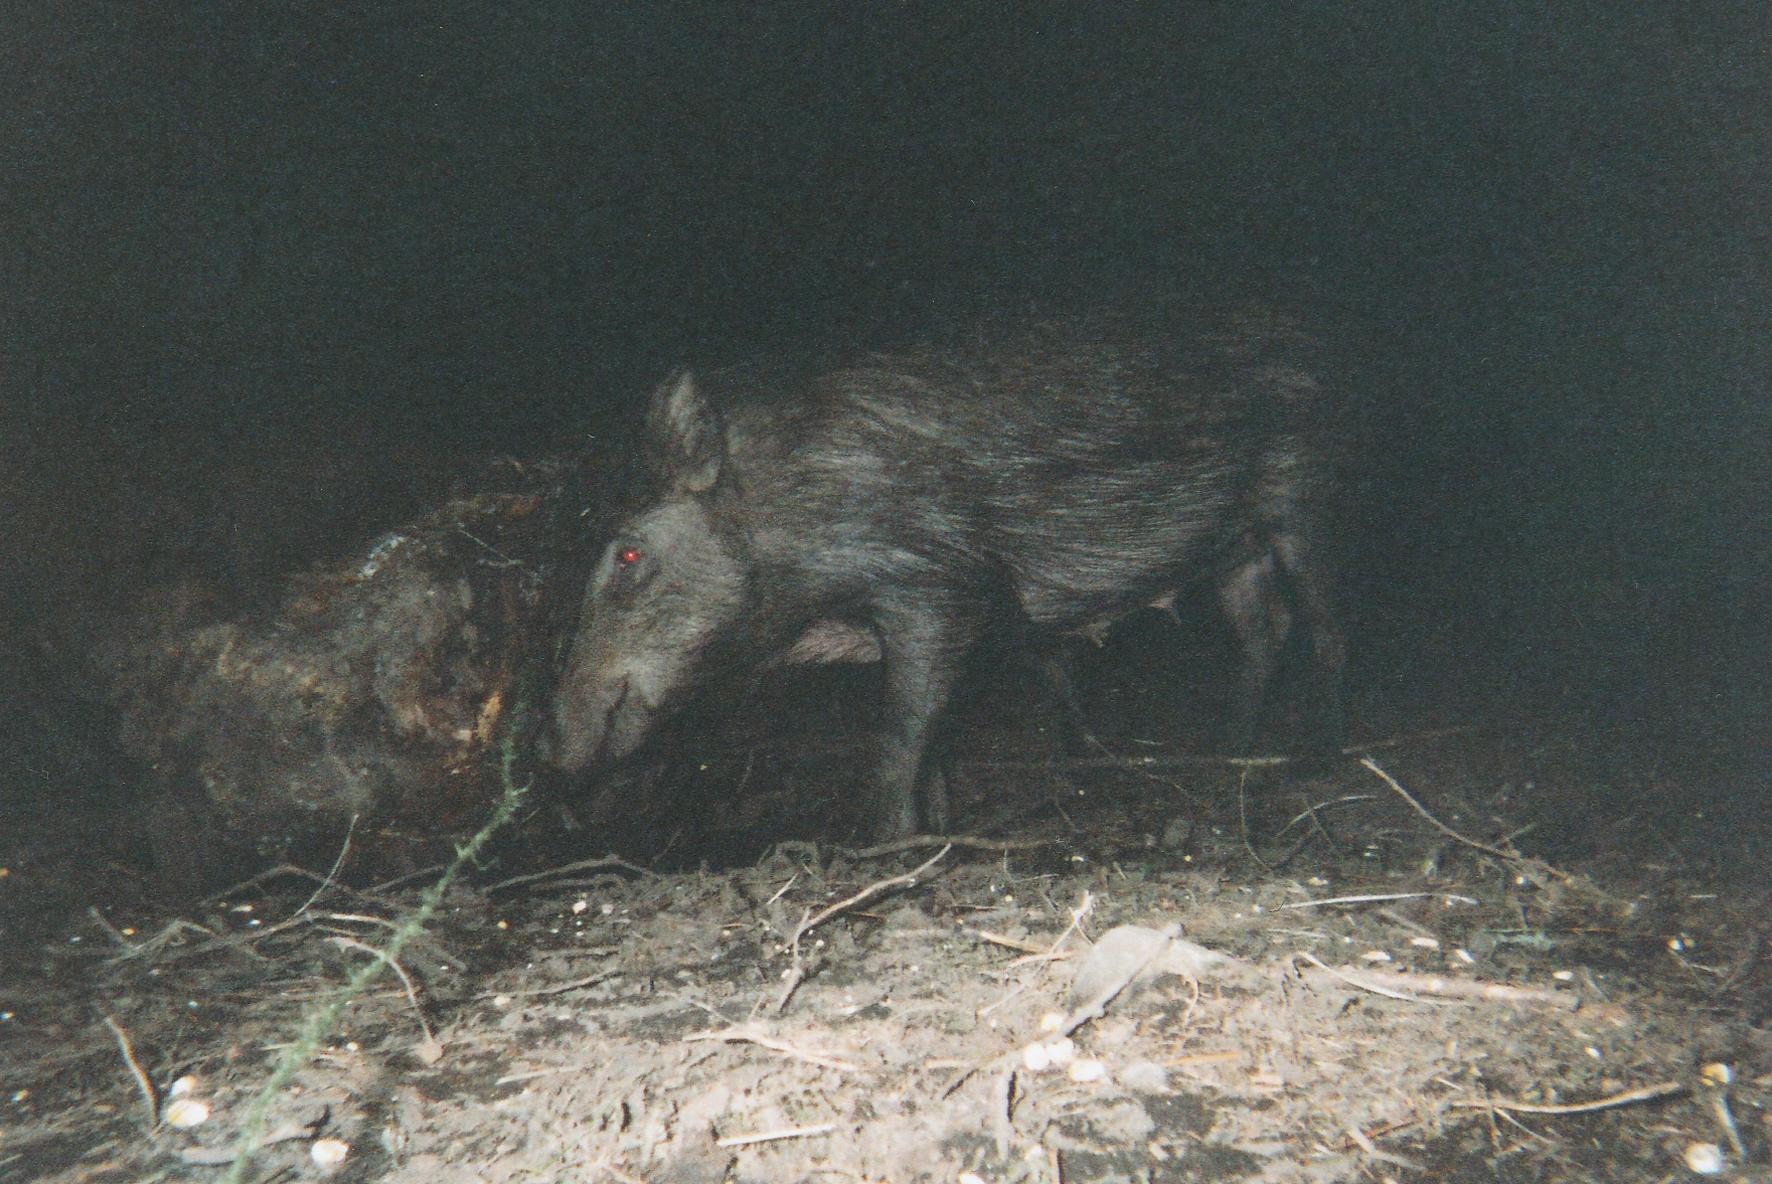 Wild Boar Photos 28.jpg